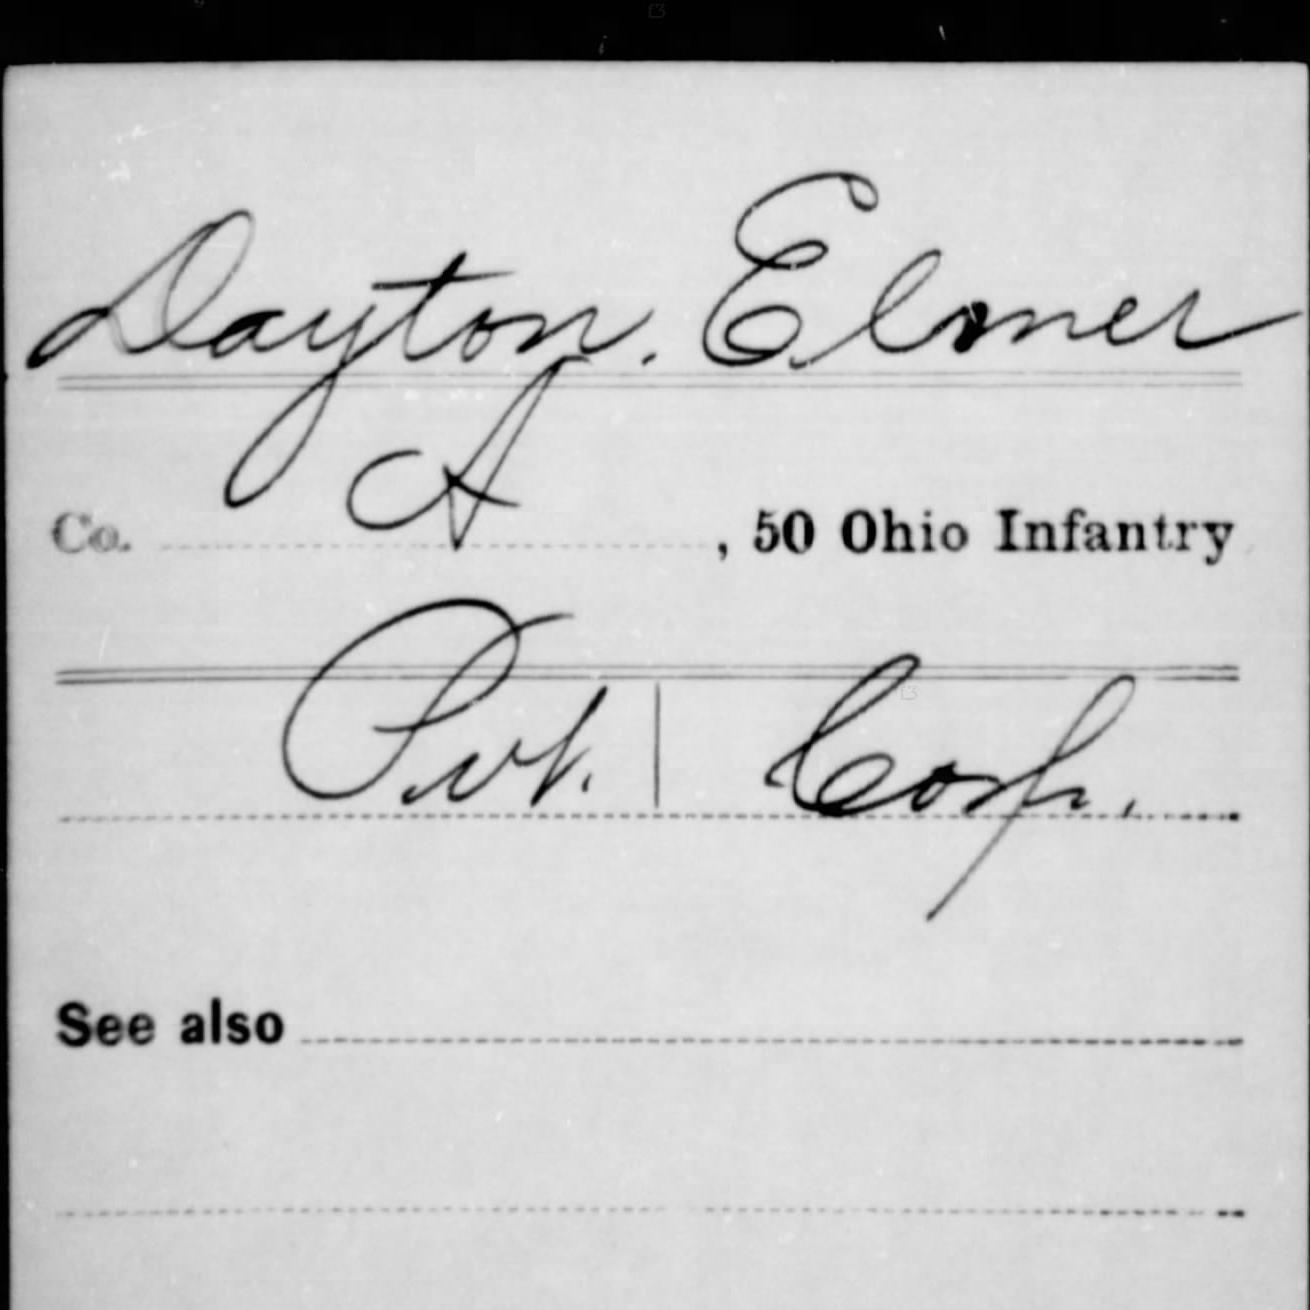 Cpl. Elmer Dayton, Co. A, 50th OH Infantry, USA